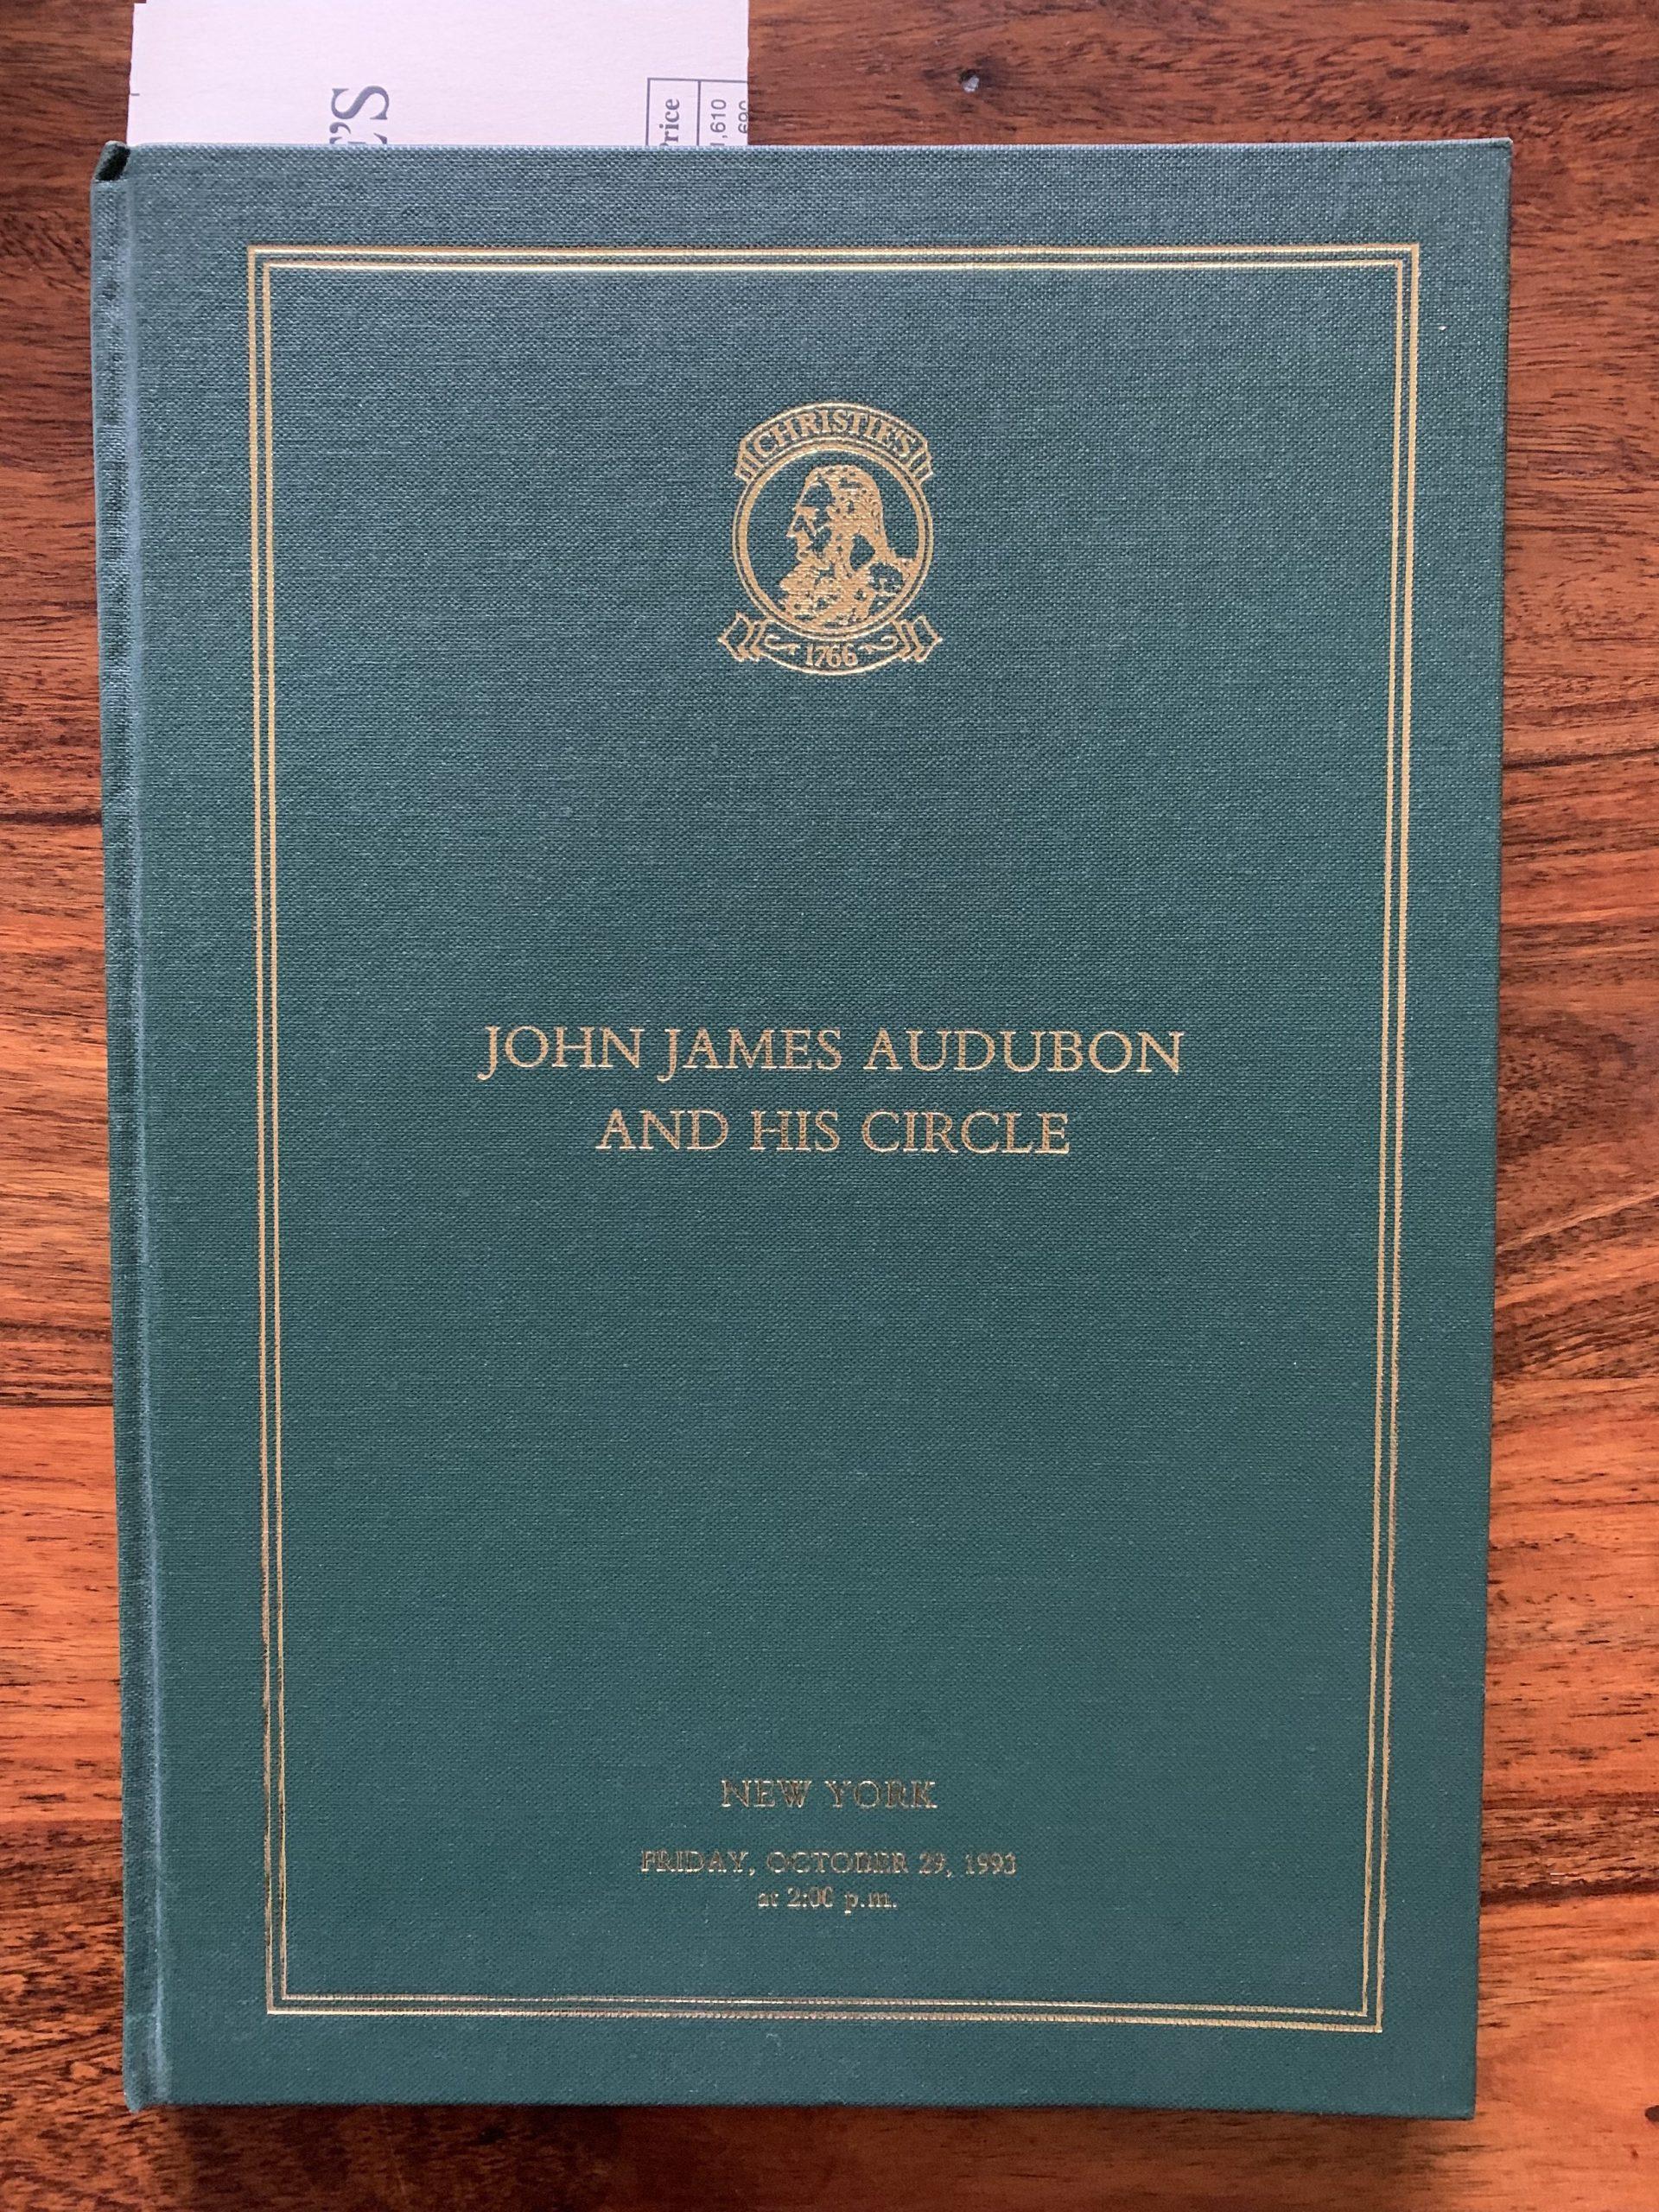 Christie's. John James Audubon and His Circle.